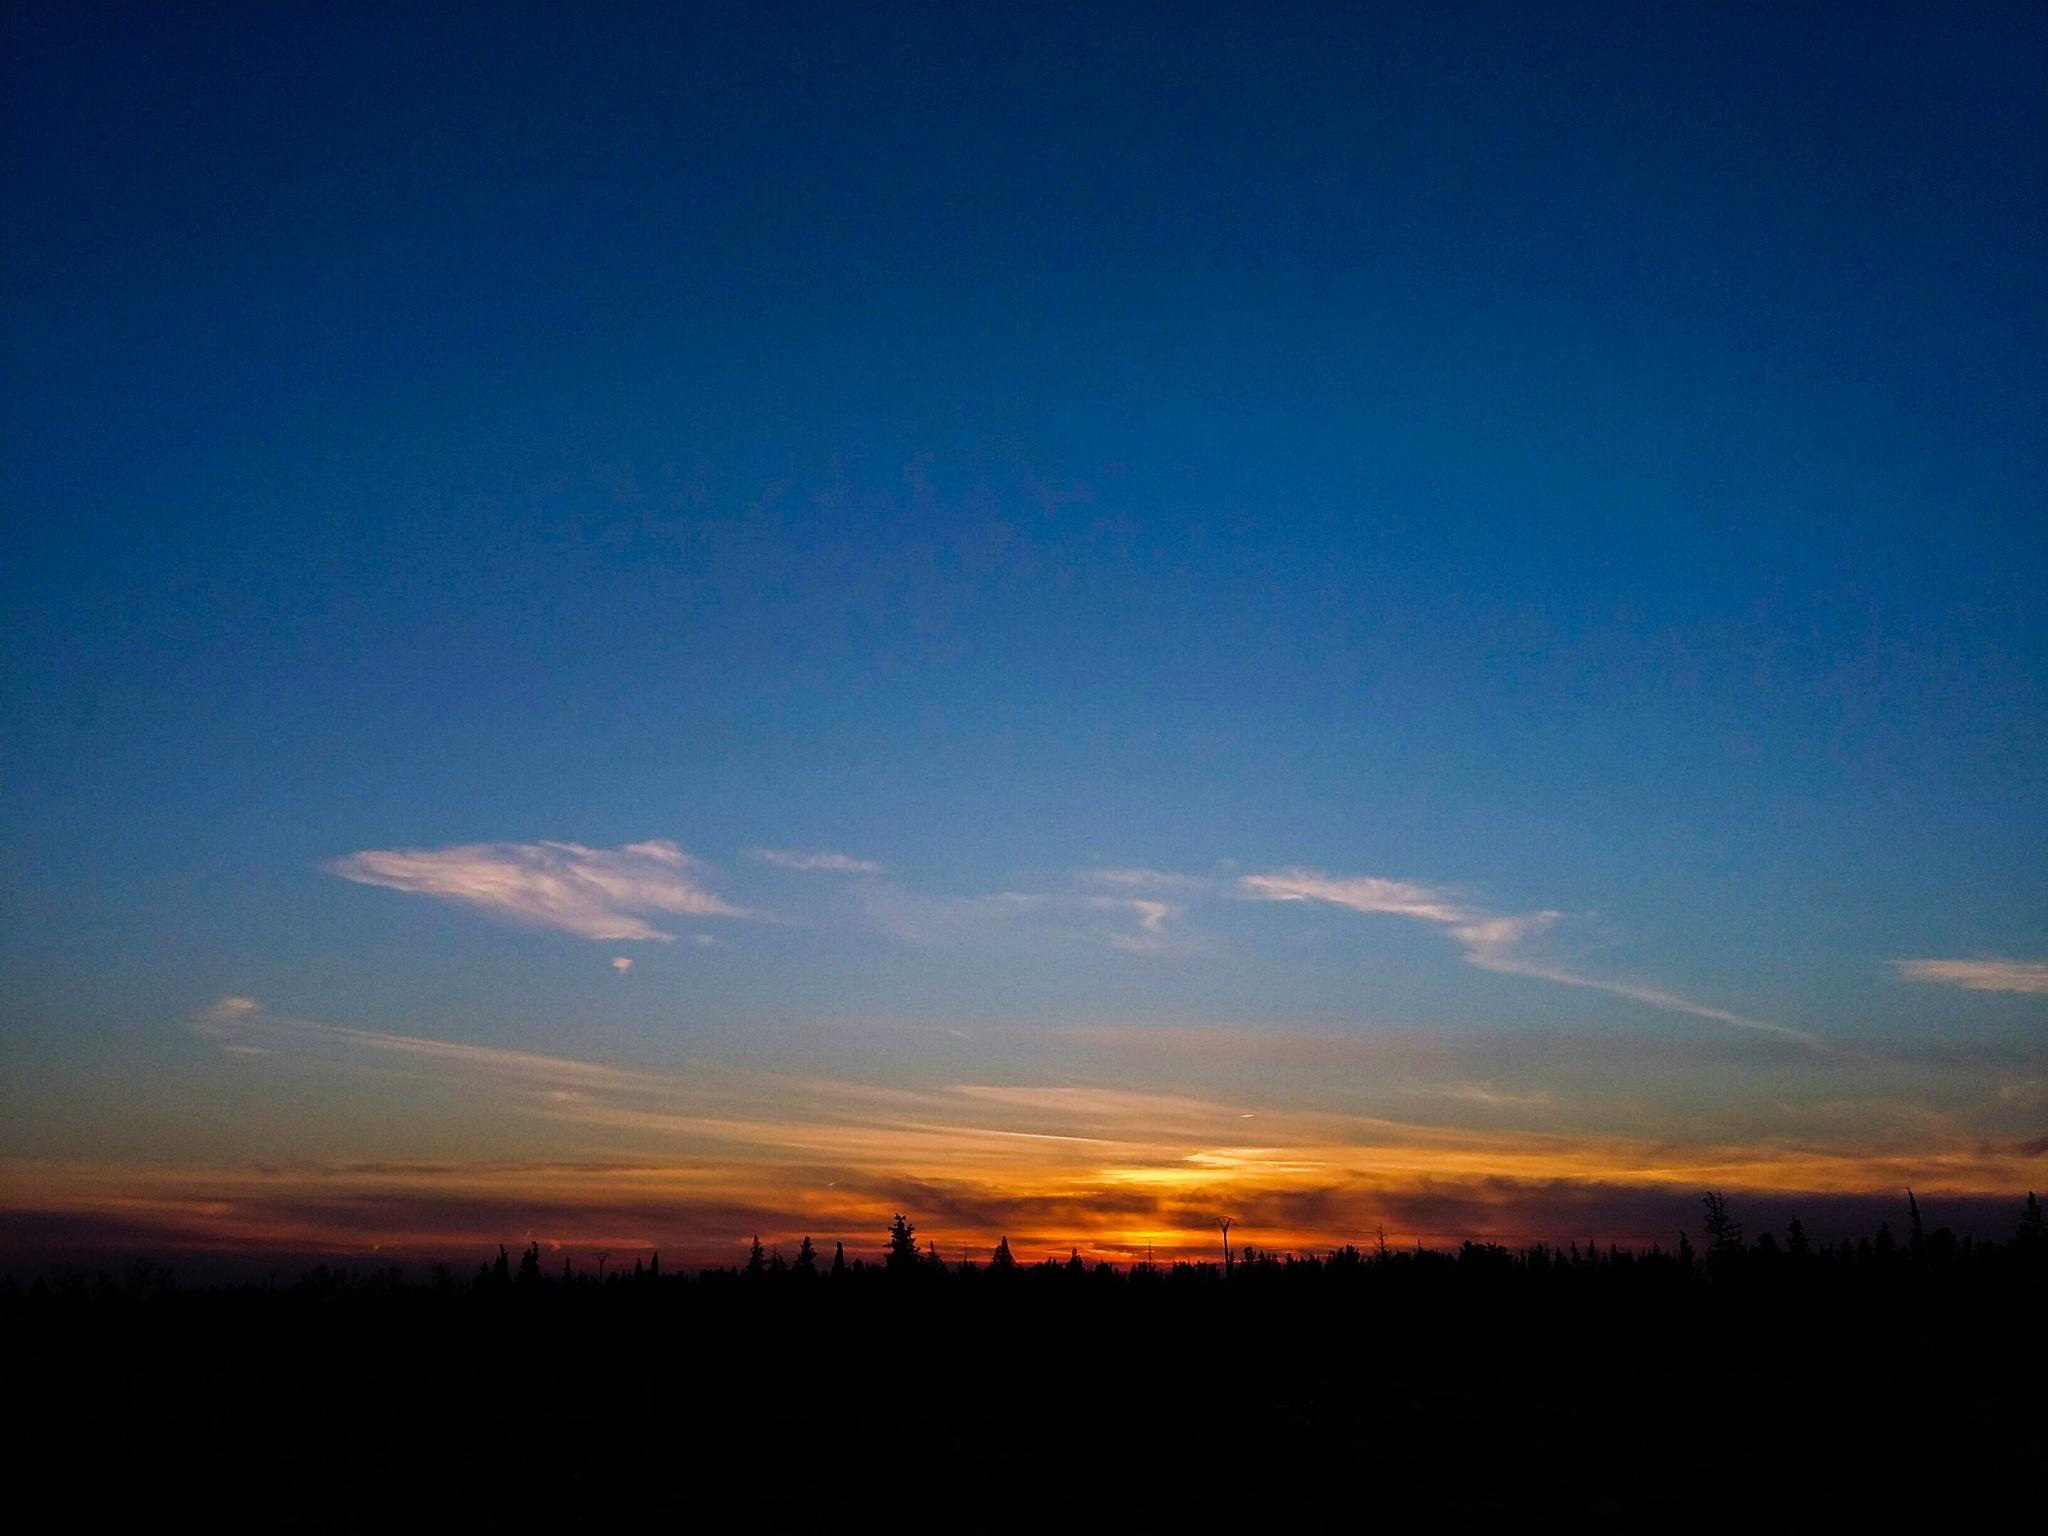 SUNSET by Abdellah Ait Othman